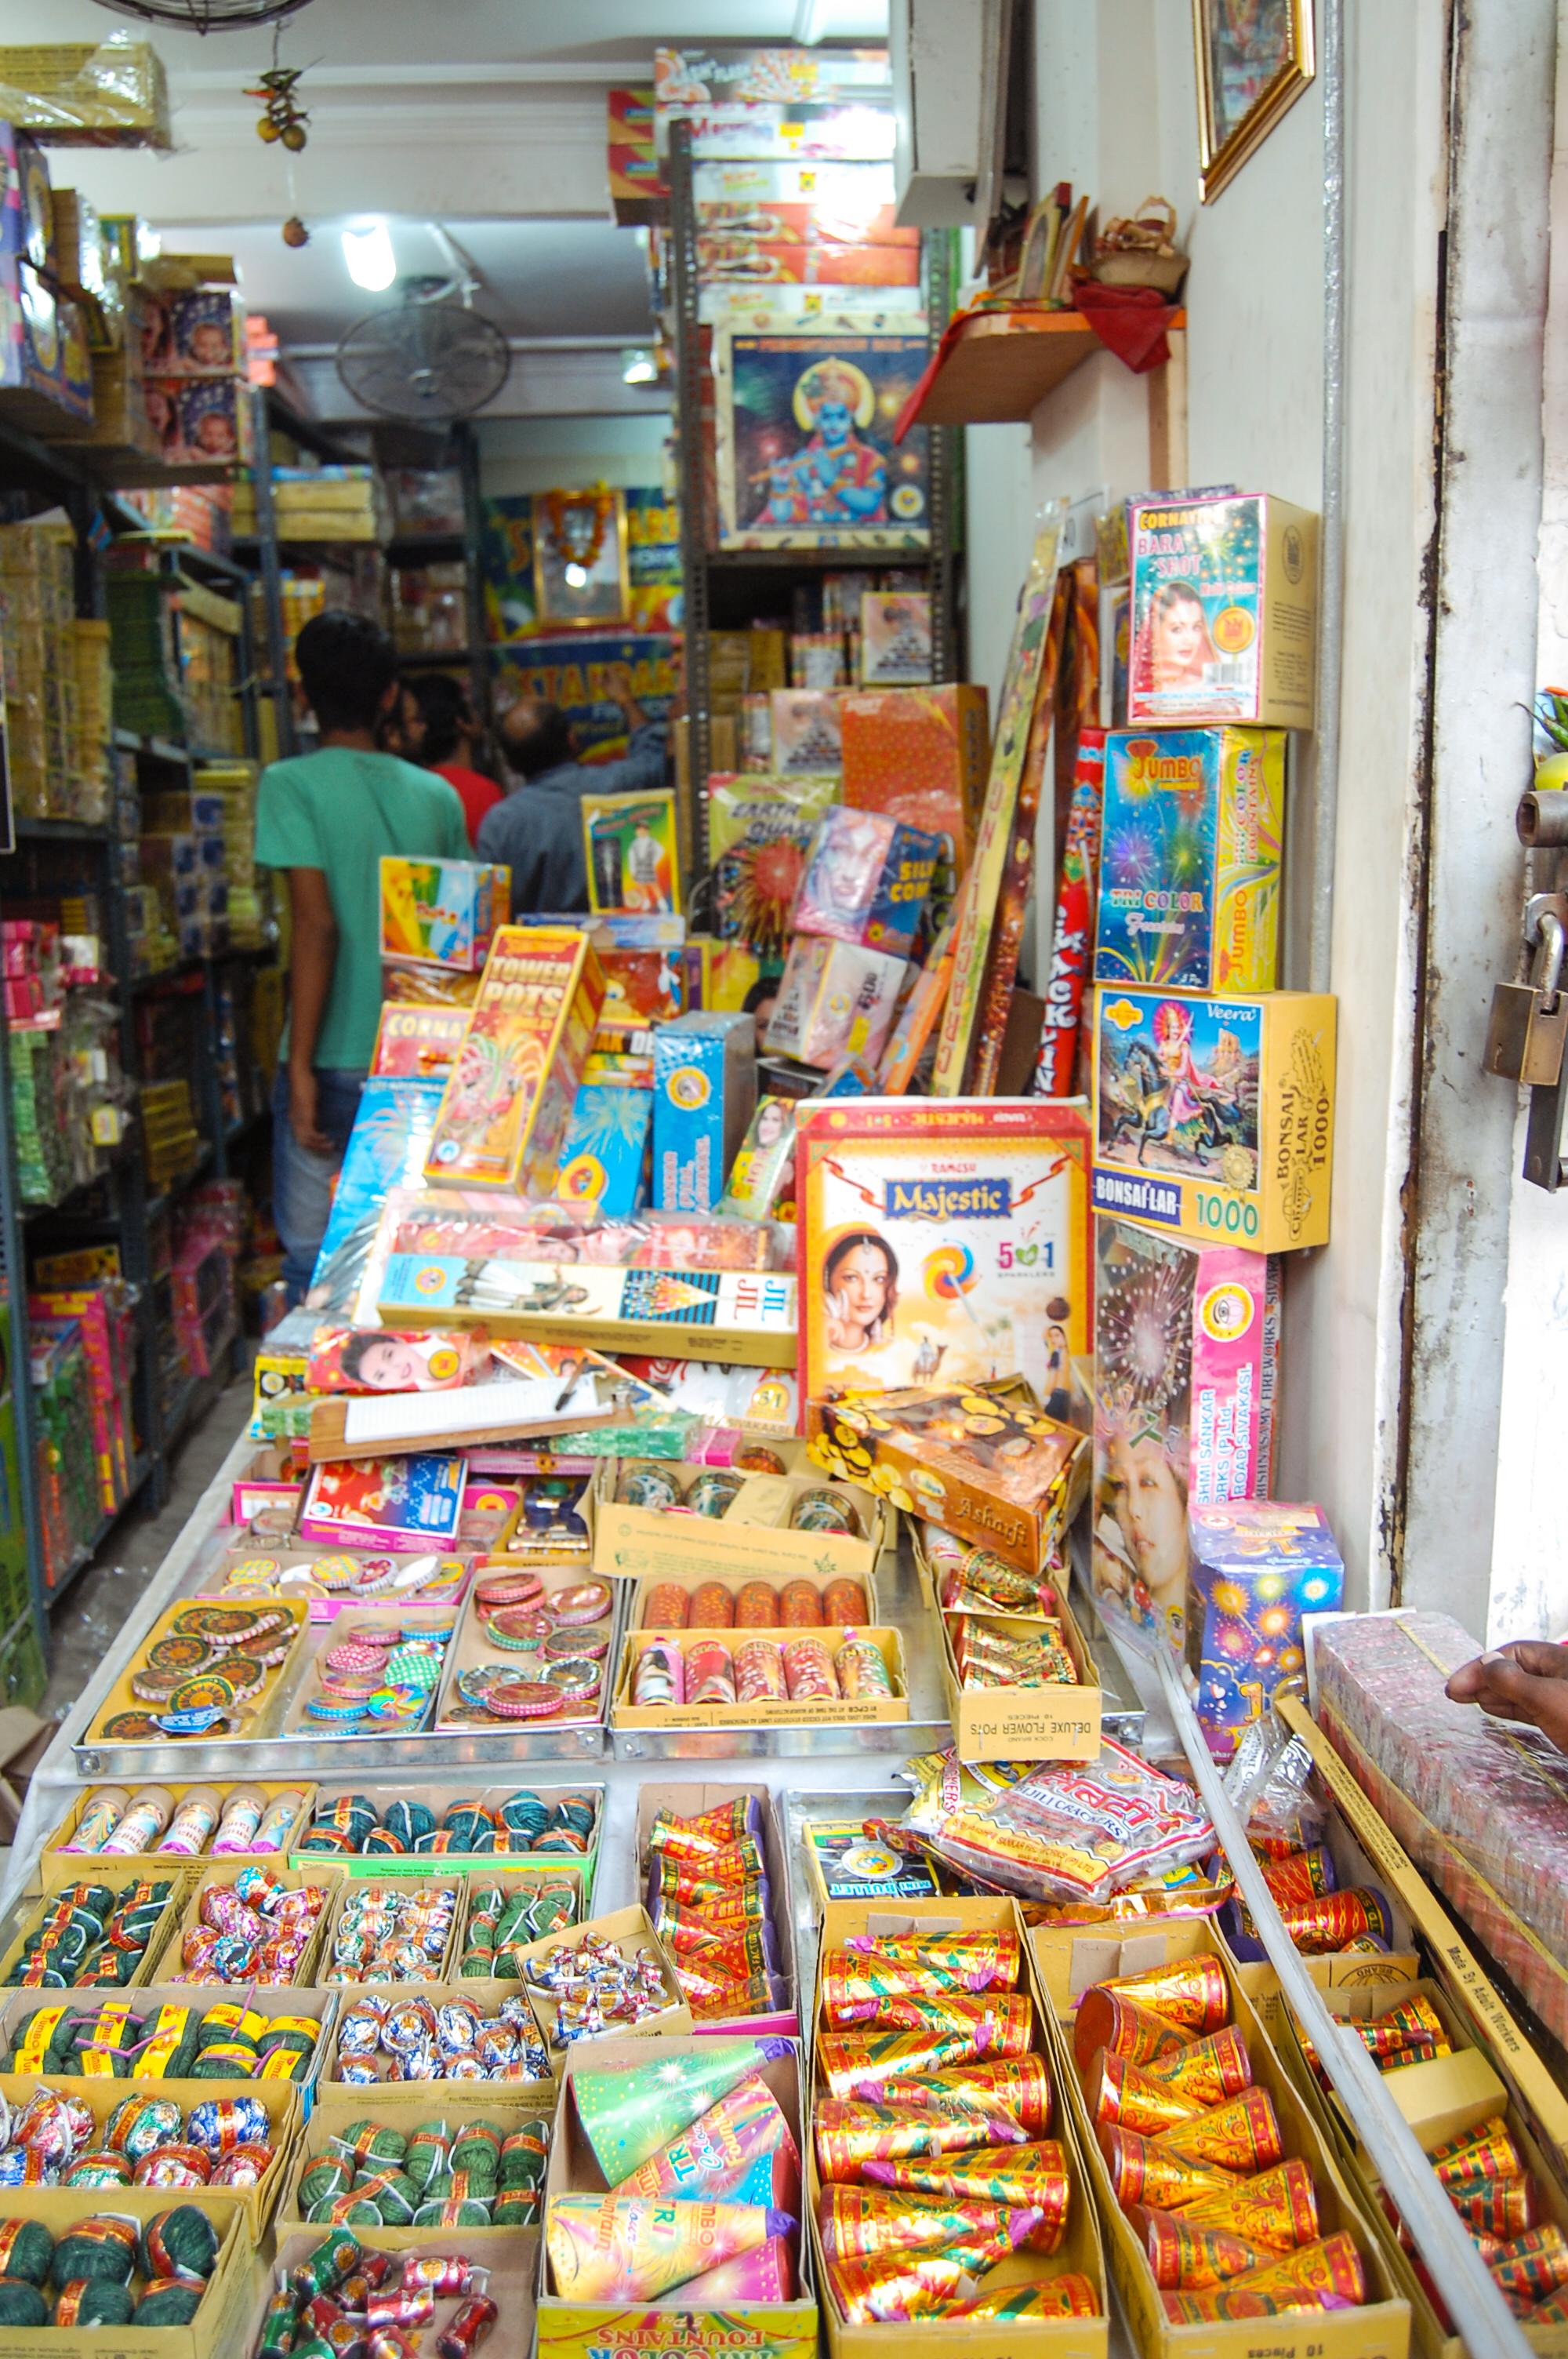 Firecrackers Street In Chandni Chowk The Journo Blog